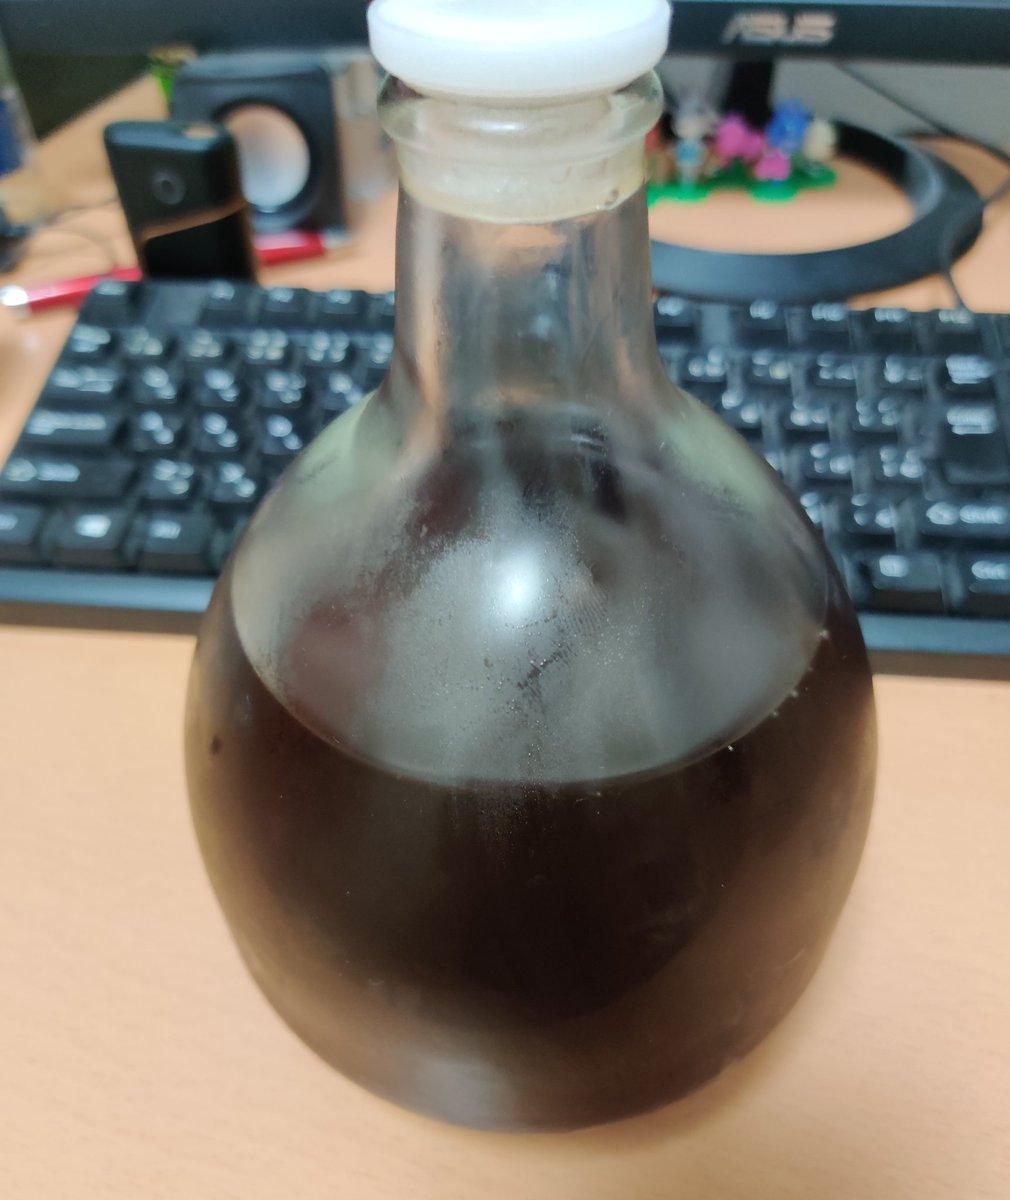 test ツイッターメディア - 明利酒類の百年梅酒プレミアムの瓶で戴冠式ごっこして遊んでた https://t.co/62HPHCG5eu